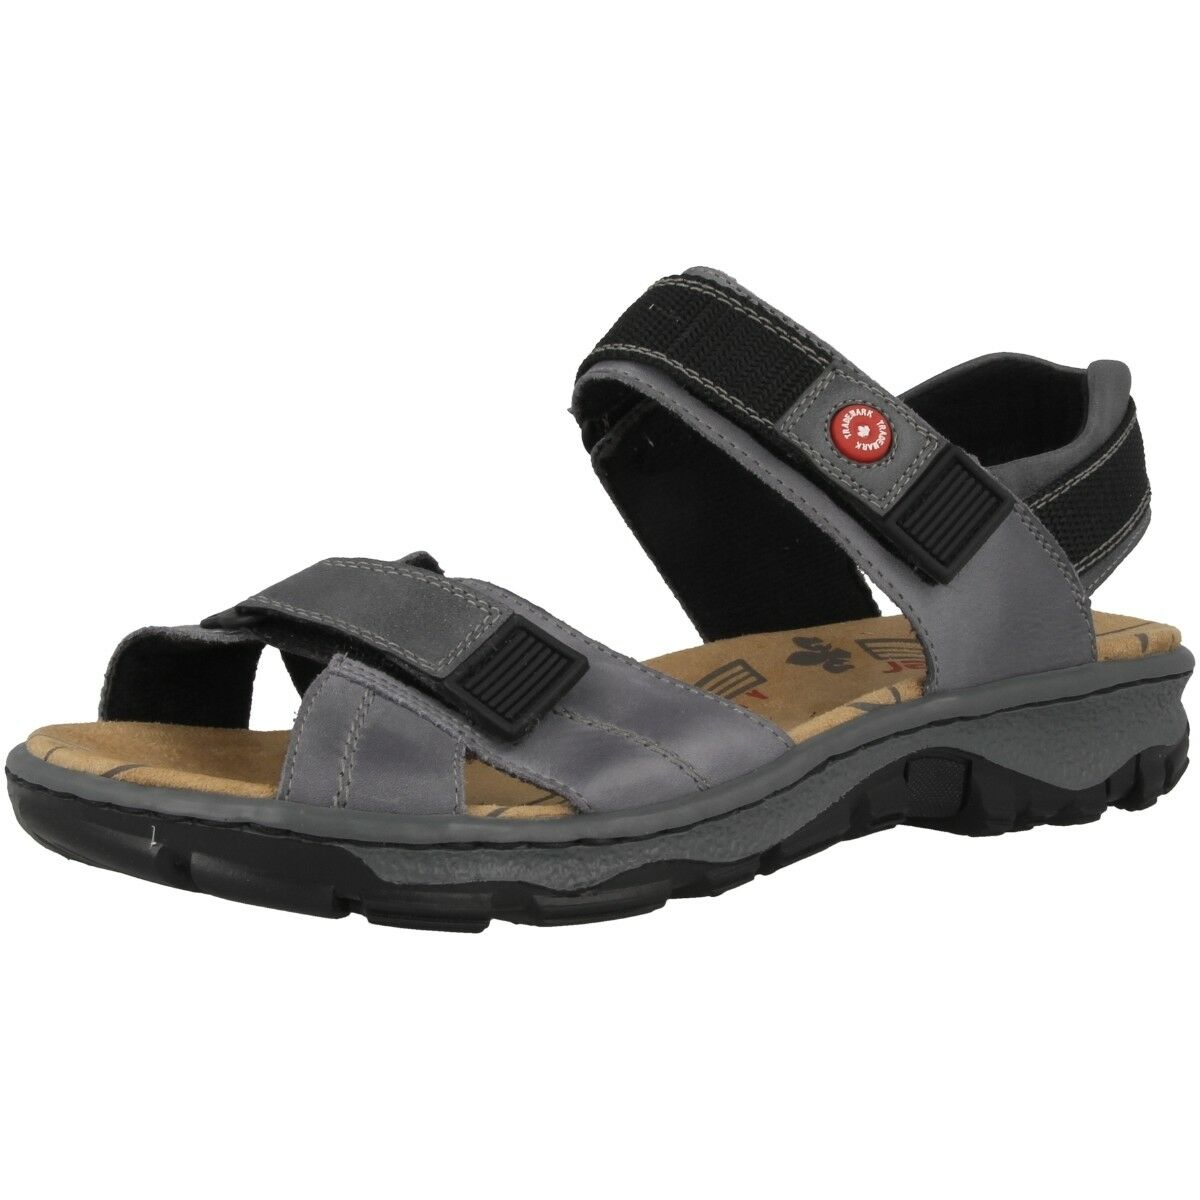 Rieker Gange-Preston Scarpe Outdoor Sandali ANTISTRESS Sandali 68851-12 | Nuovo design  | Gentiluomo/Signora Scarpa